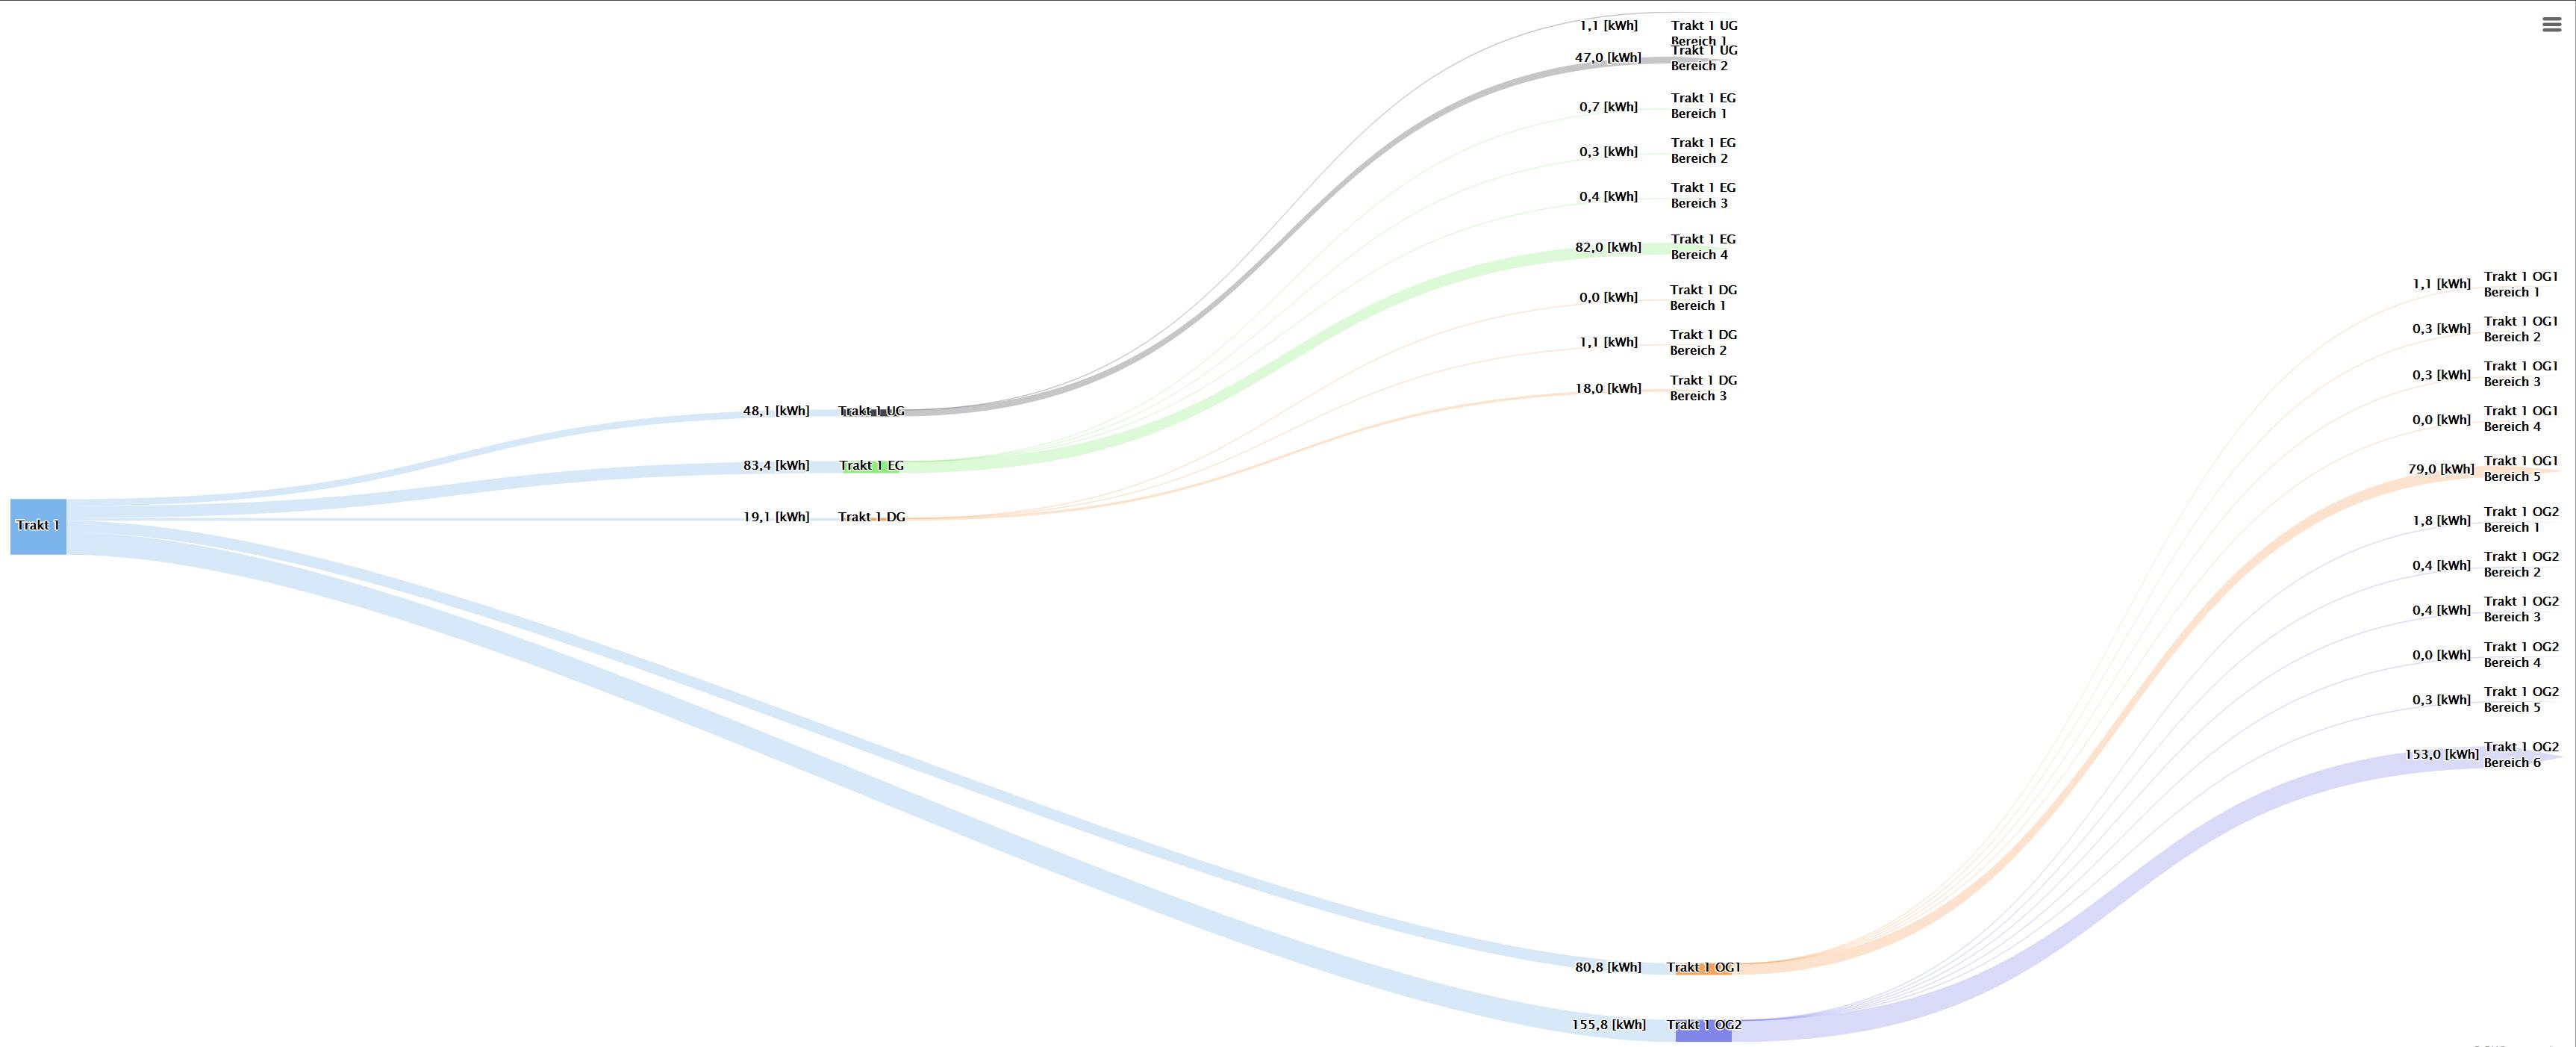 Sankey / skip columns · Issue #7354 · highcharts/highcharts · GitHub